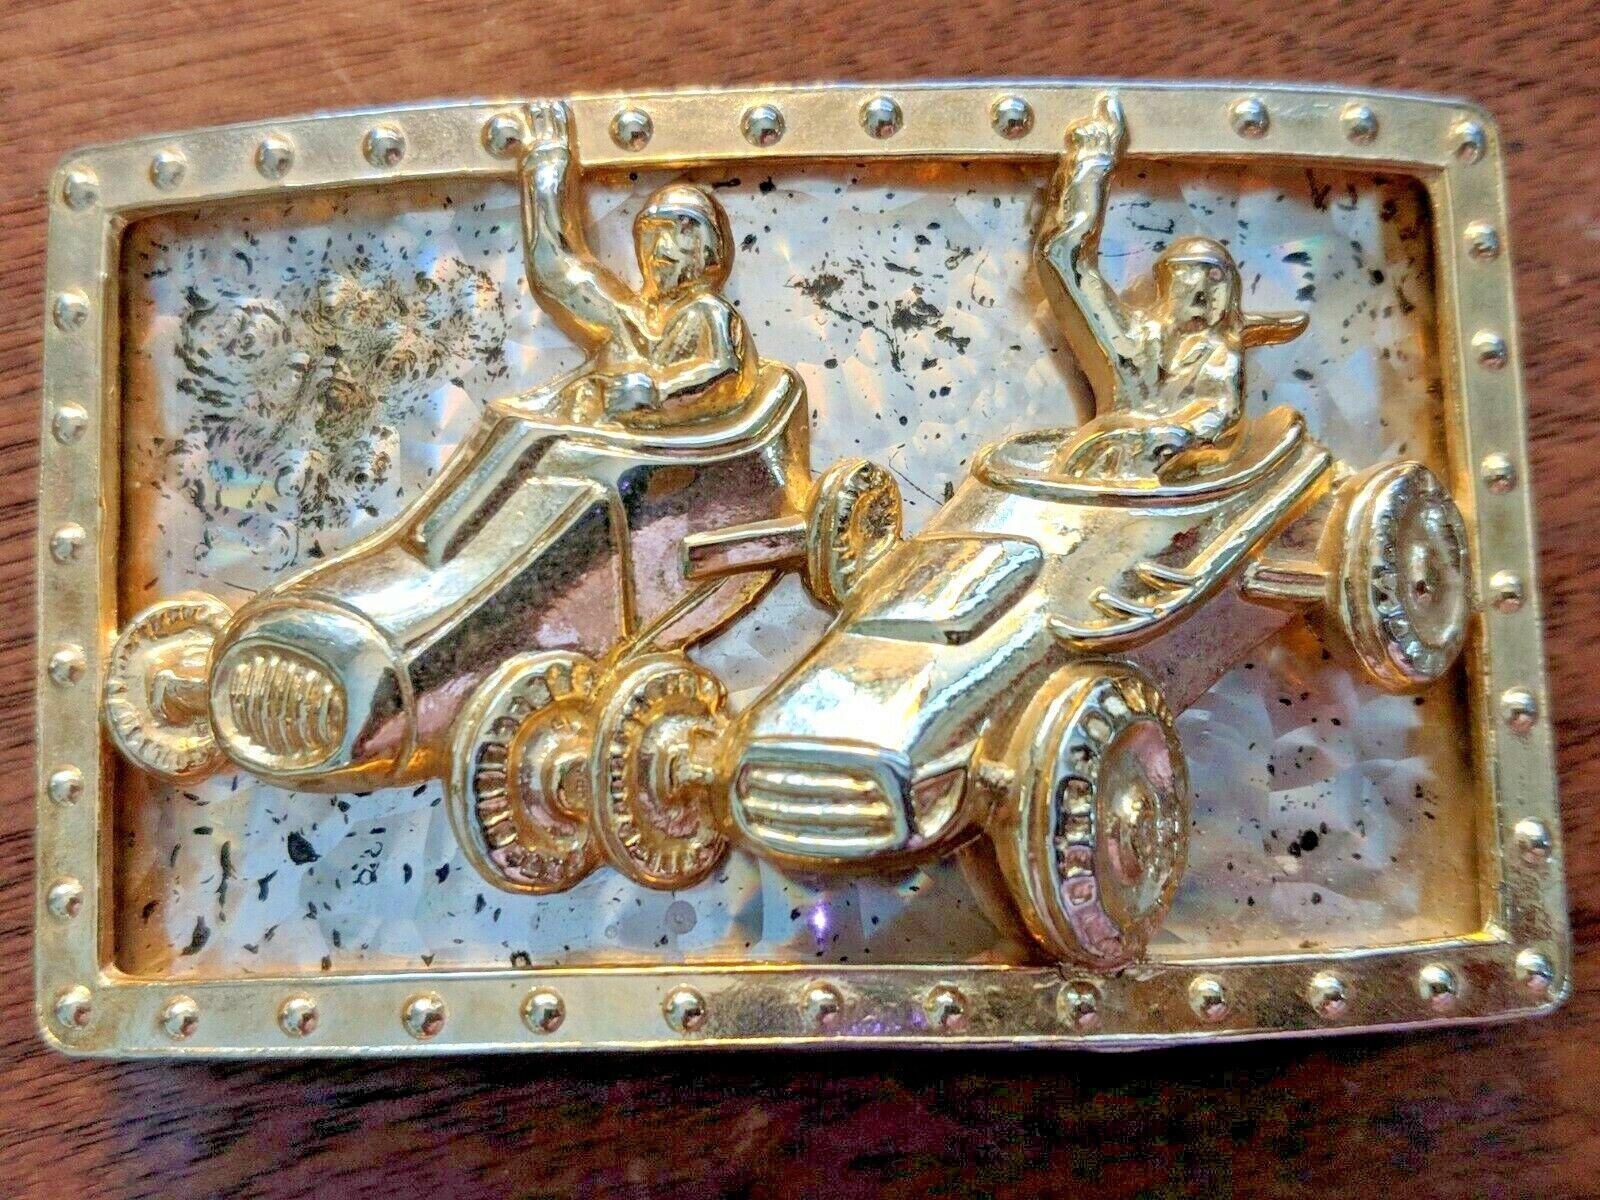 Rare Vintage Patent Pending Gold Tone 3 D Racing Race Cars & Drivers Belt Buckle